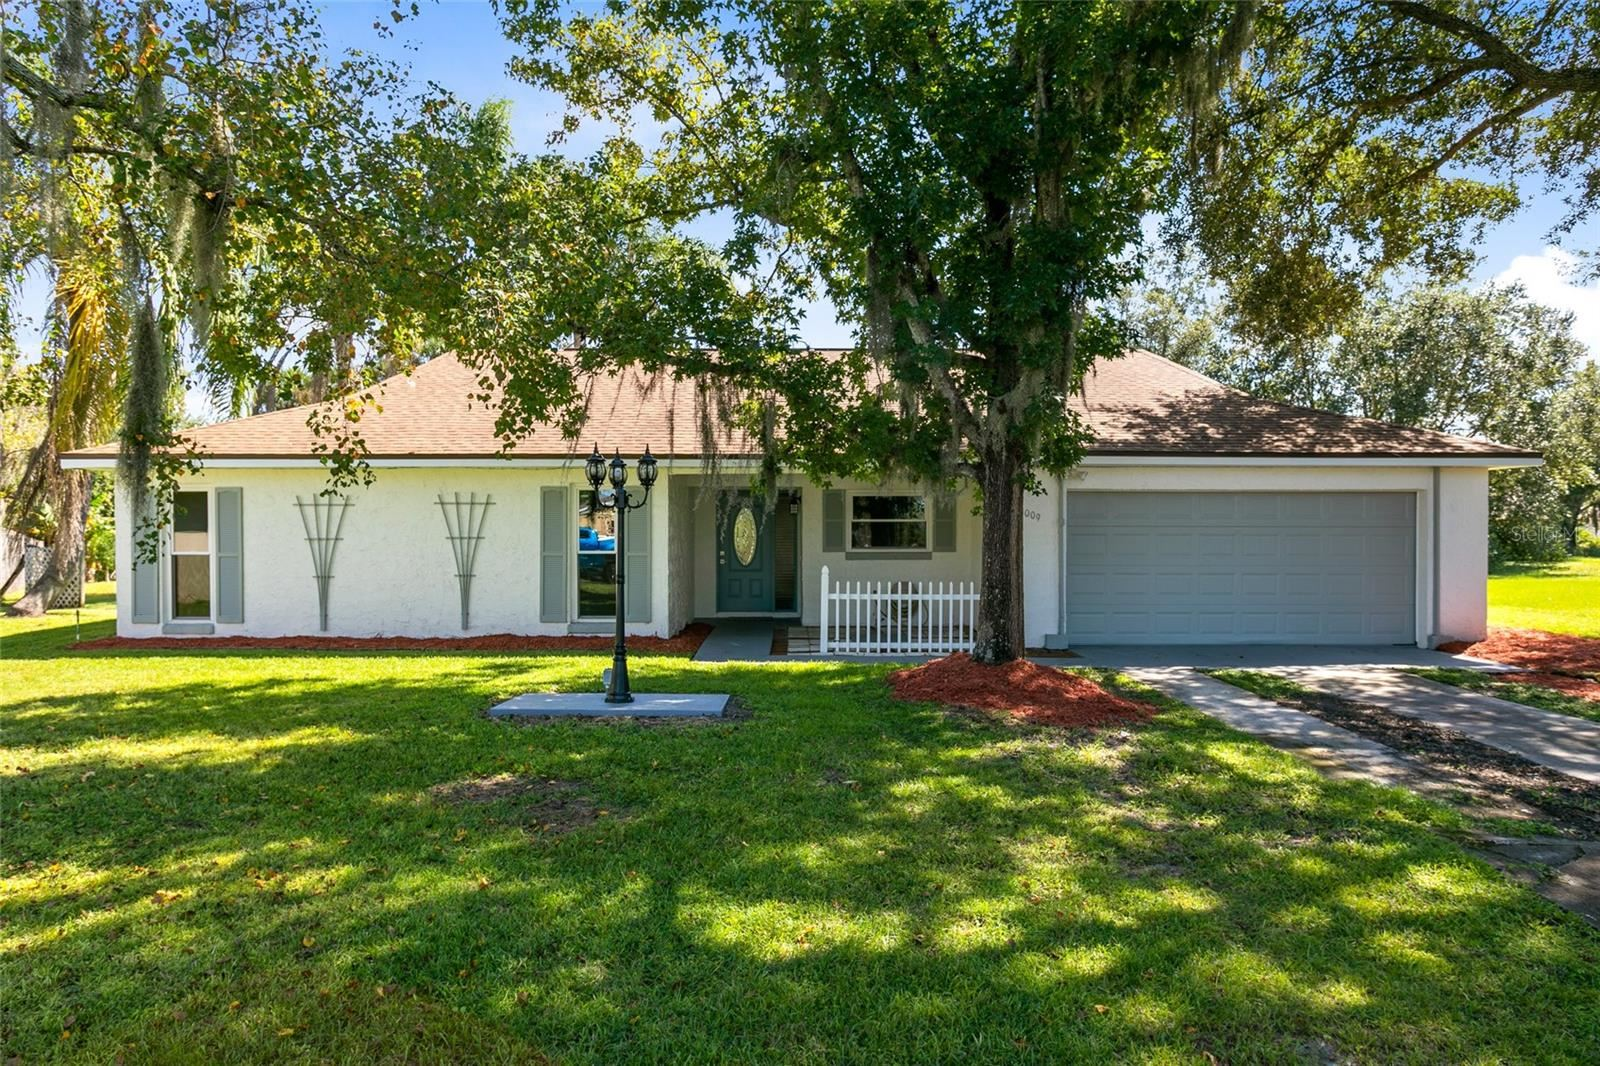 12009 FLORIDA WOODS LANE, Orlando, FL 32824 - #: O5975951